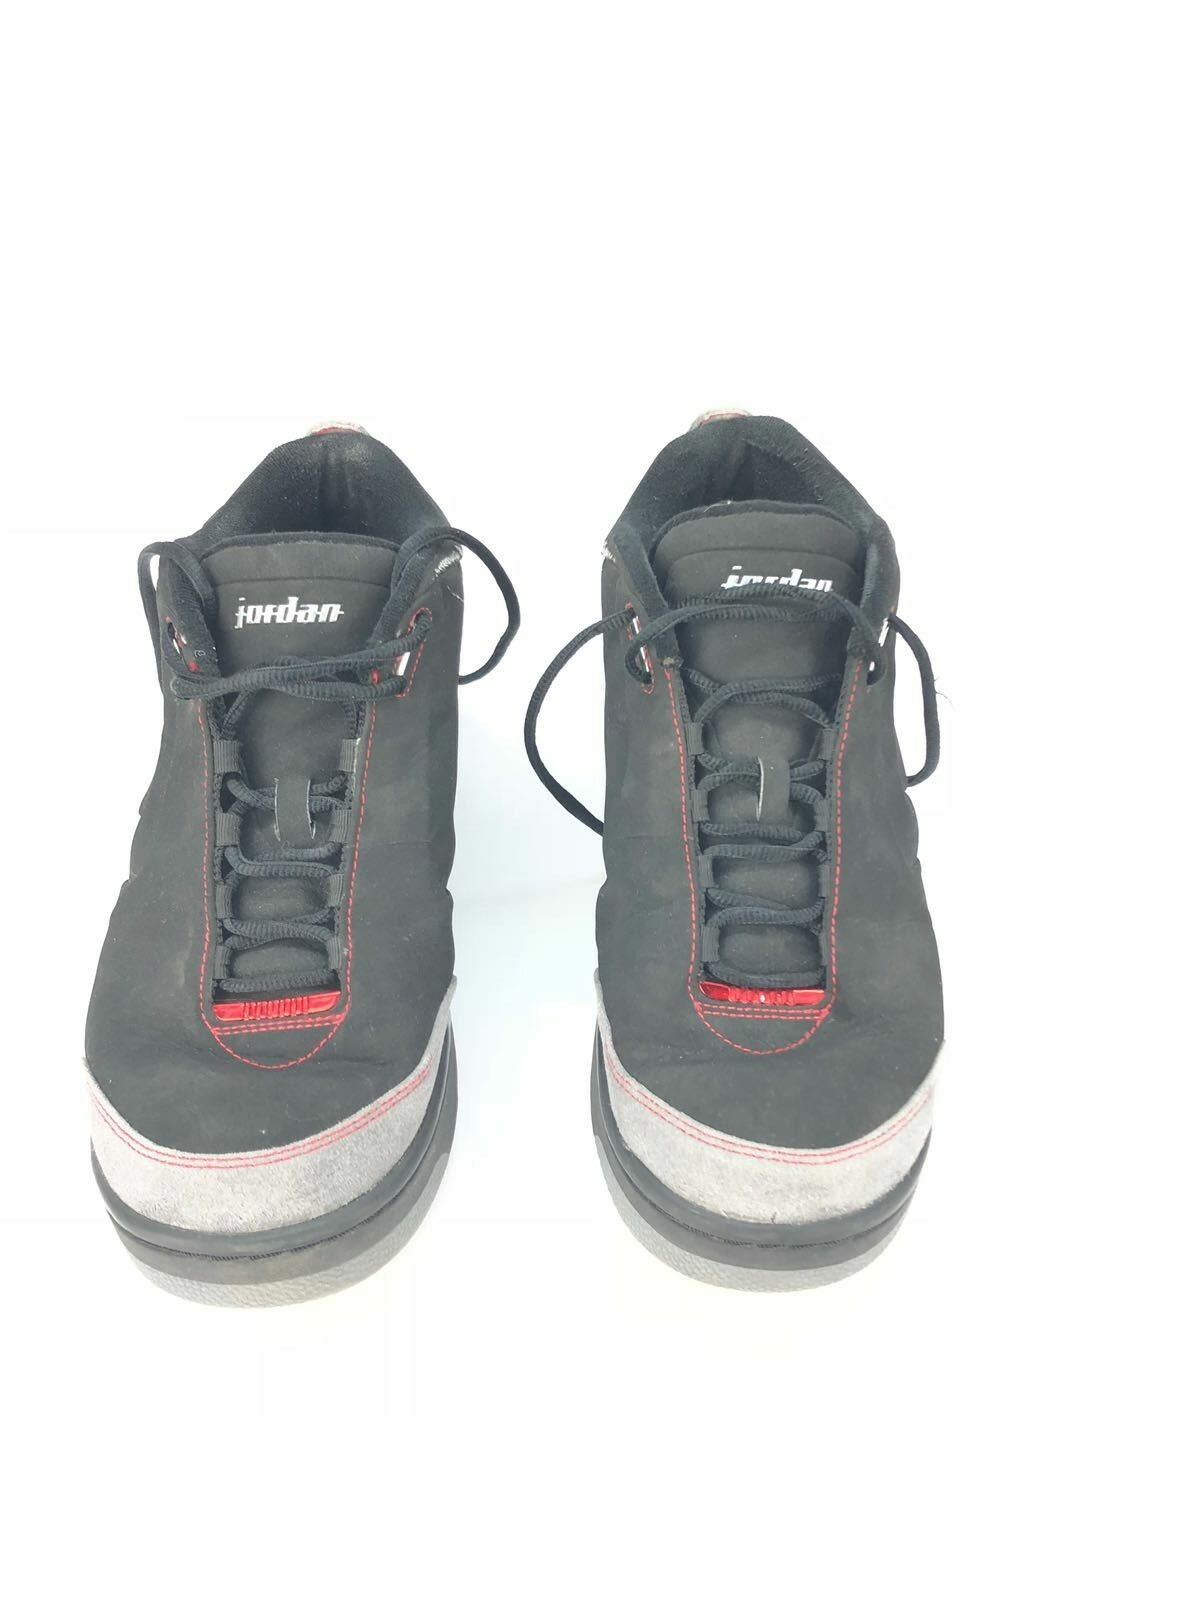 NIKE JORDAN 23 Mens Athletic Sneakers shoes basketball US size 12